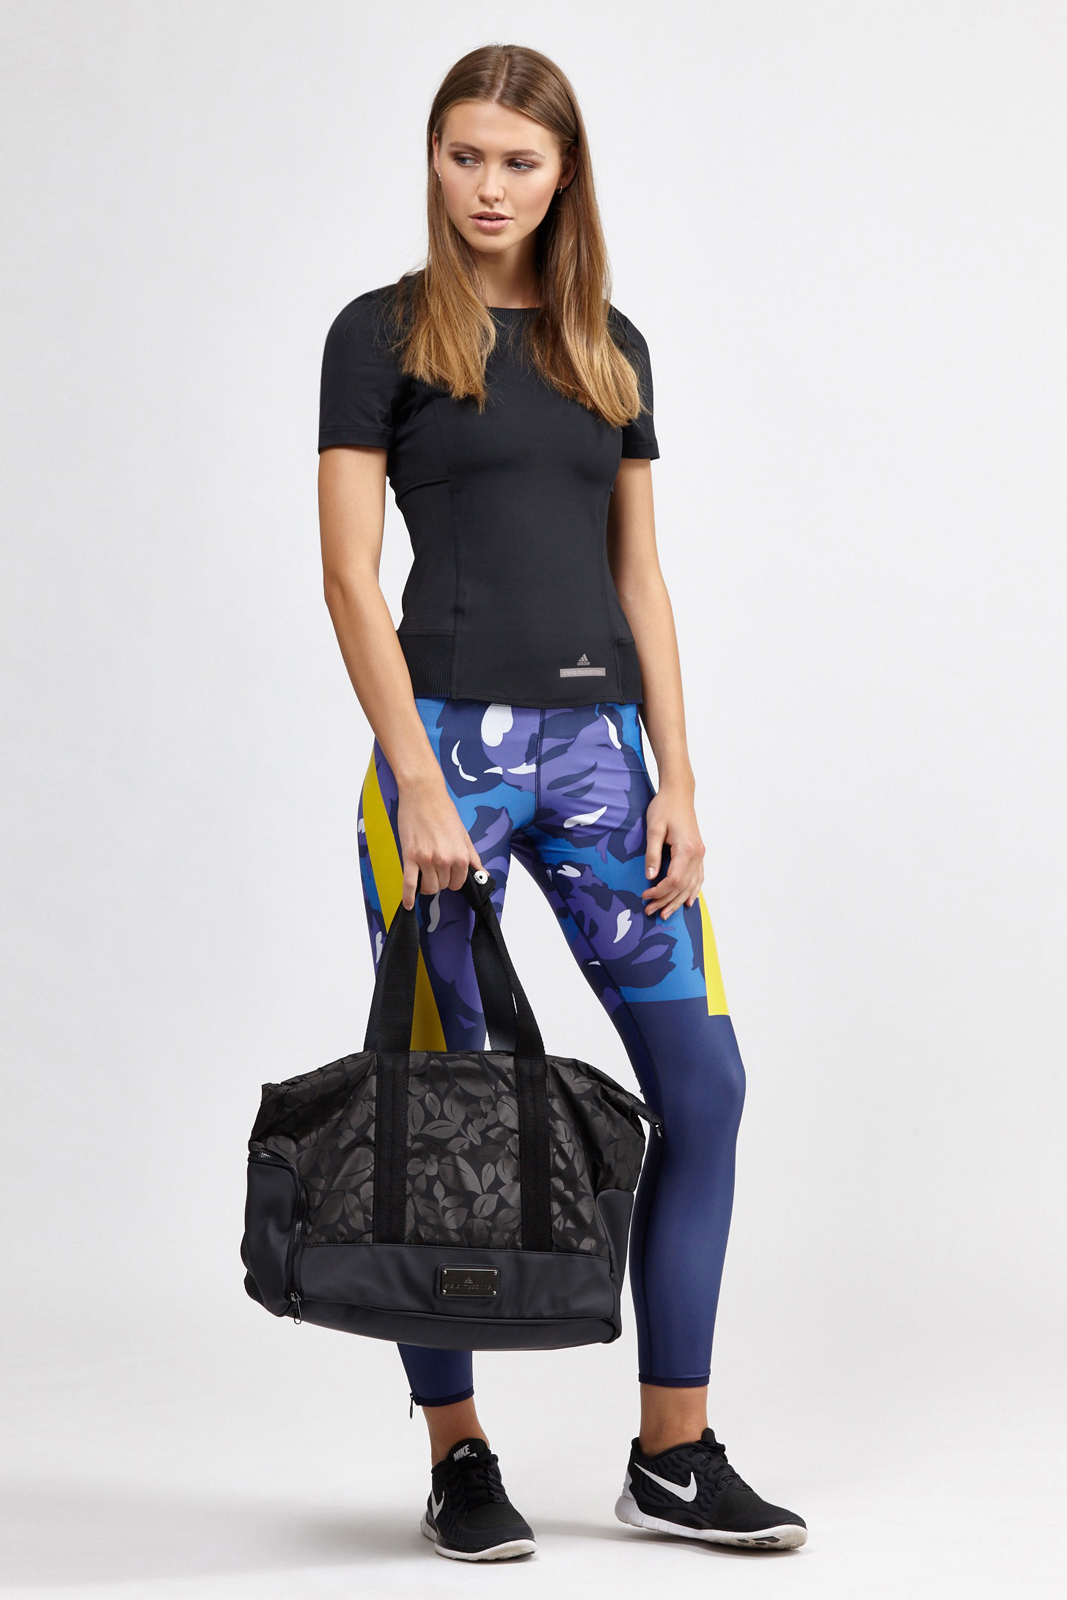 d1e584f772 Womens Small Gym Duffel Bag